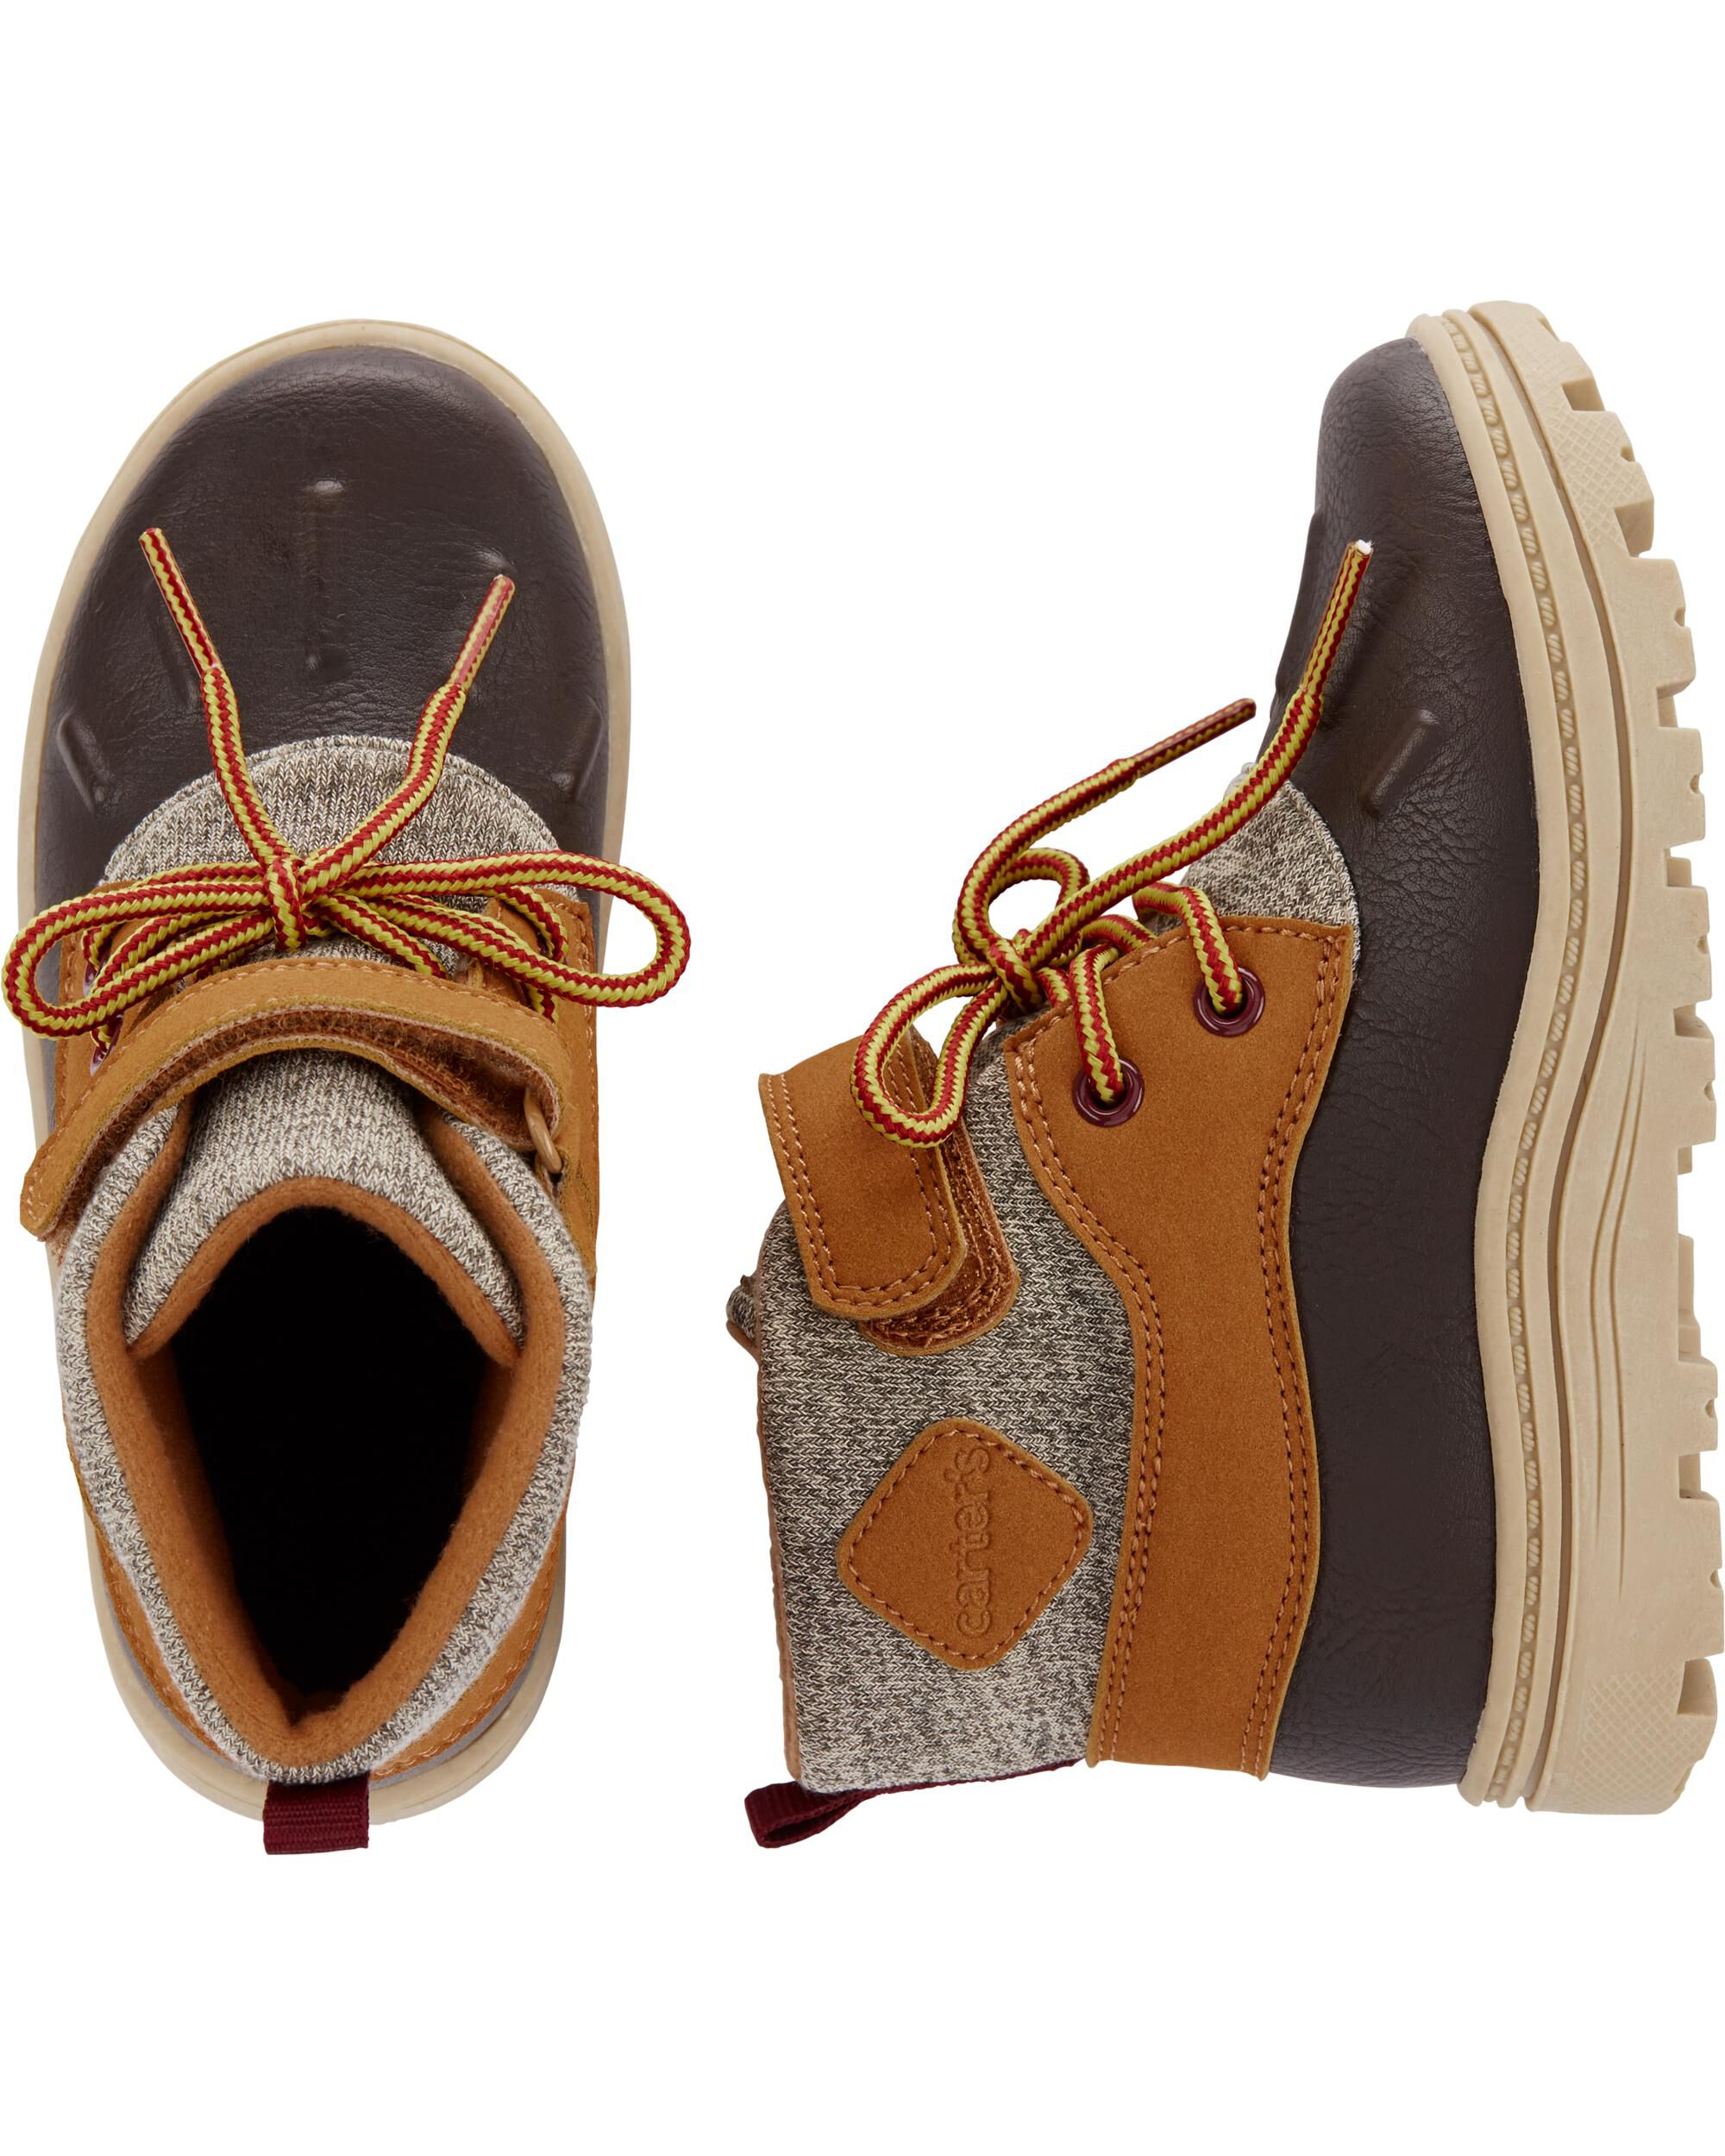 Carter's Duck Boots | carters.com